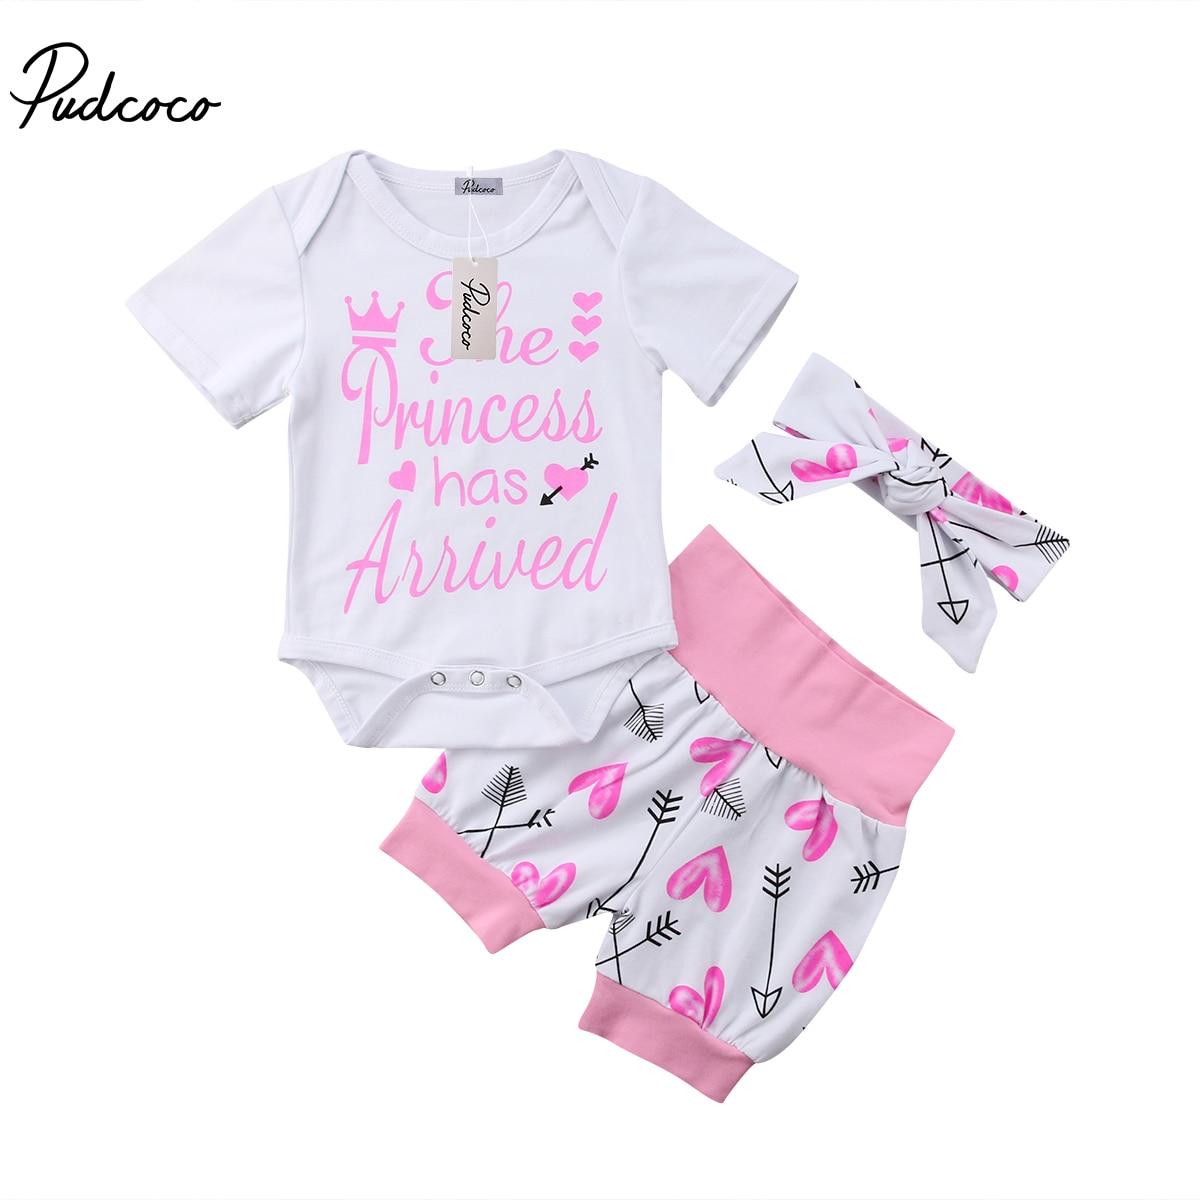 Pudcoco Newborn Baby Girls Clothes Cotton Letter Print Romper Pants Leggings Outfits Set Summer Infant Clothing 3pcs